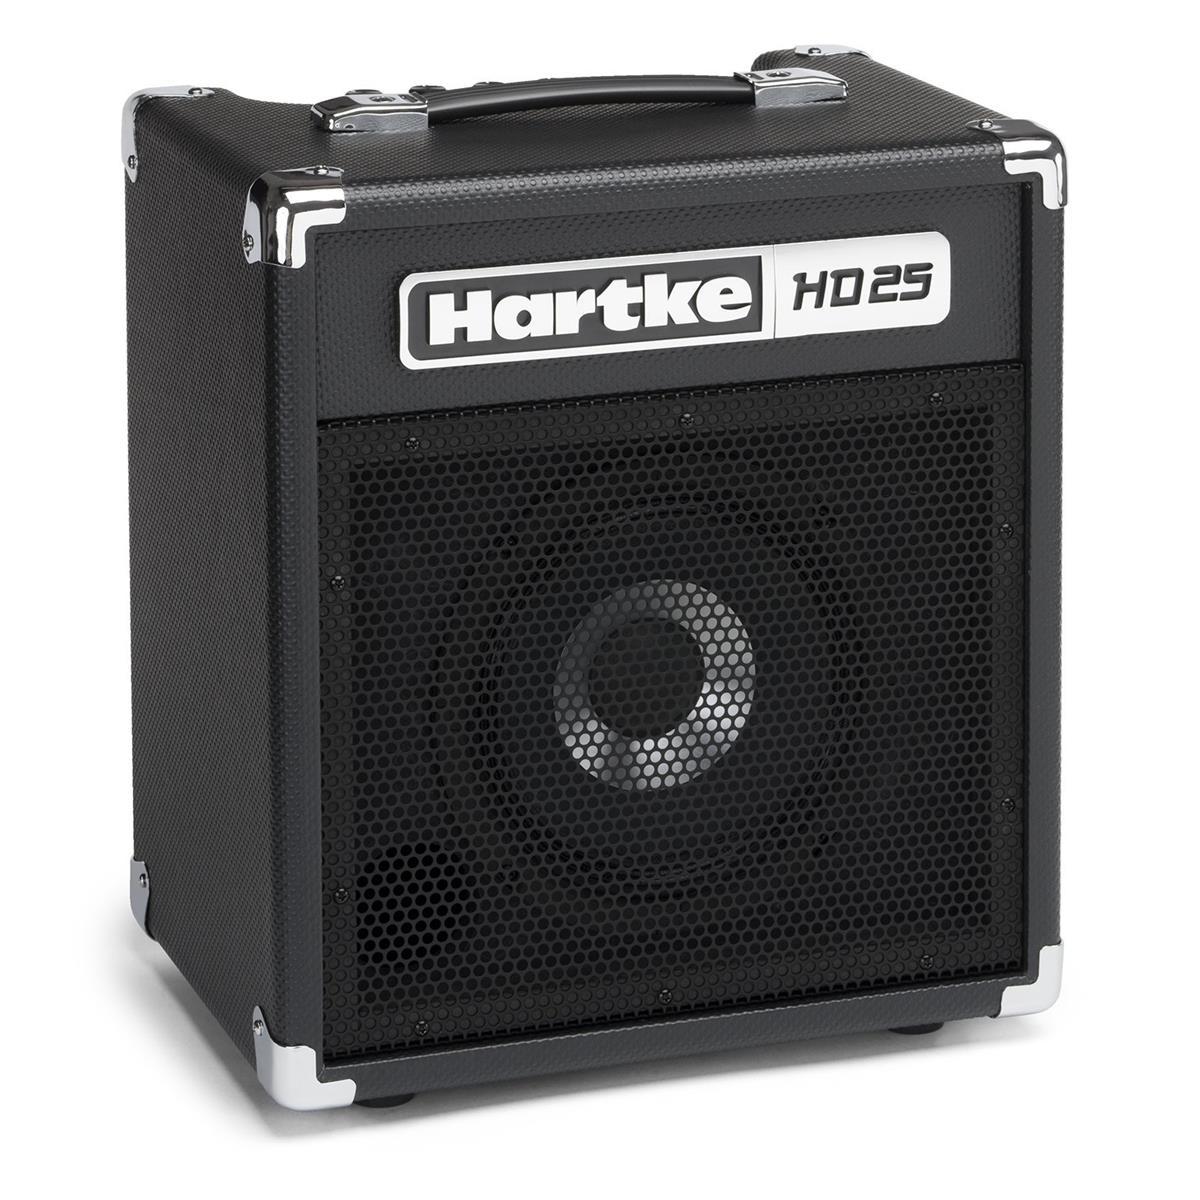 Hartke HD25 - 1x8 - 25W - Bassi Amplificatori - Combo